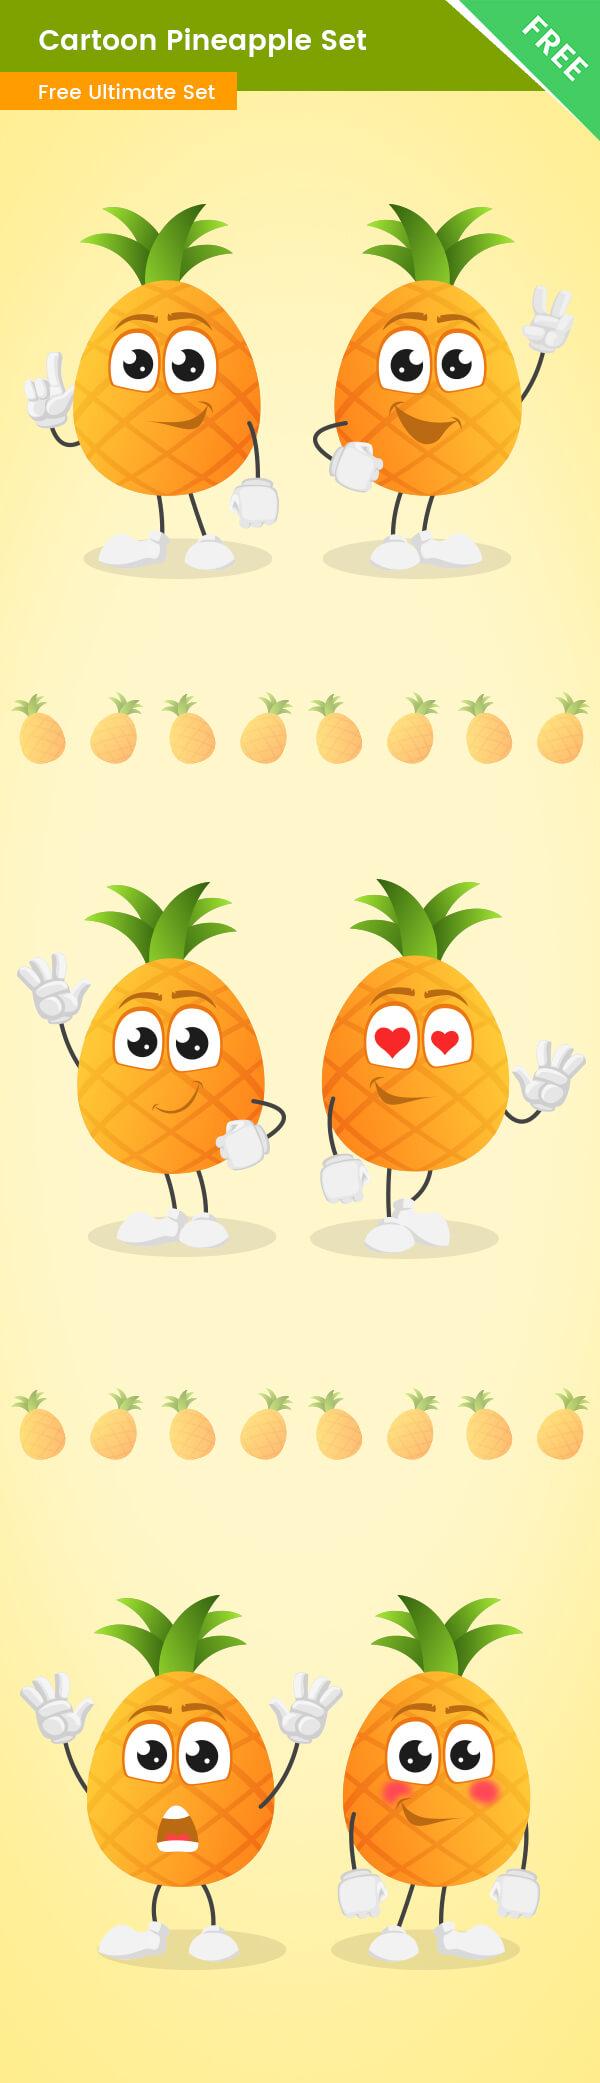 Cartoon Pineapple Vector Set